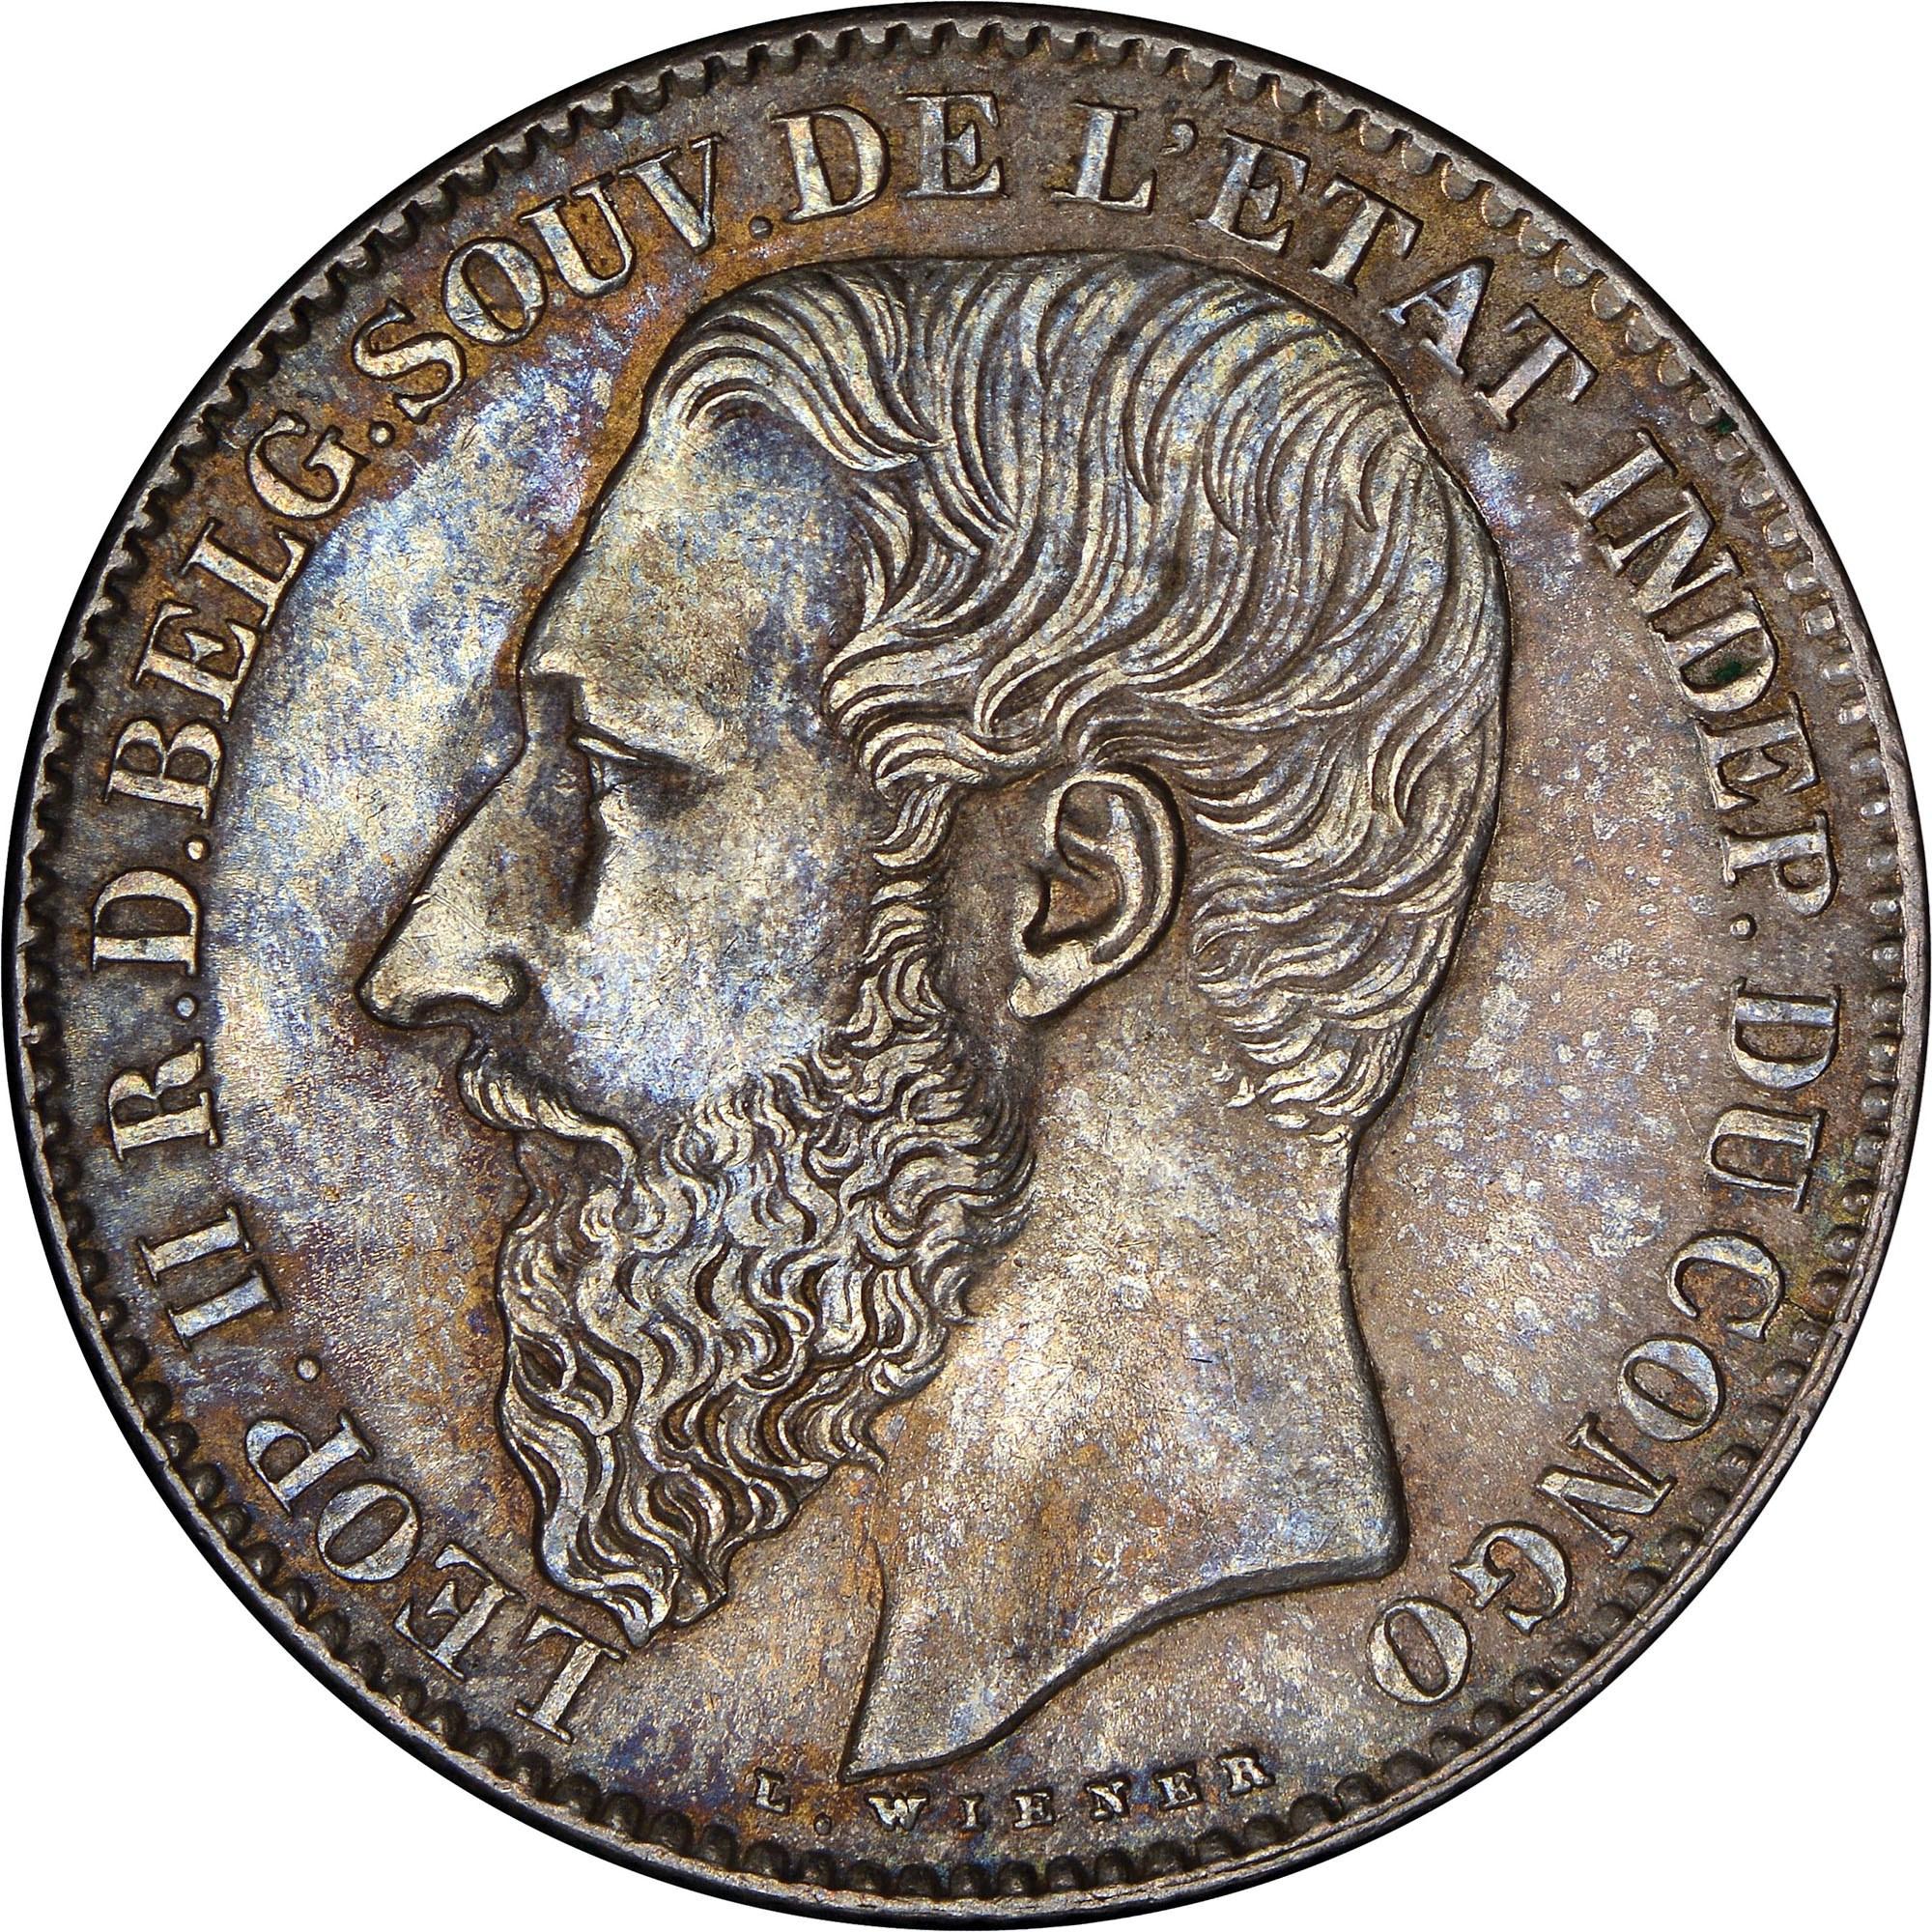 Congo Free State 2 Francs obverse